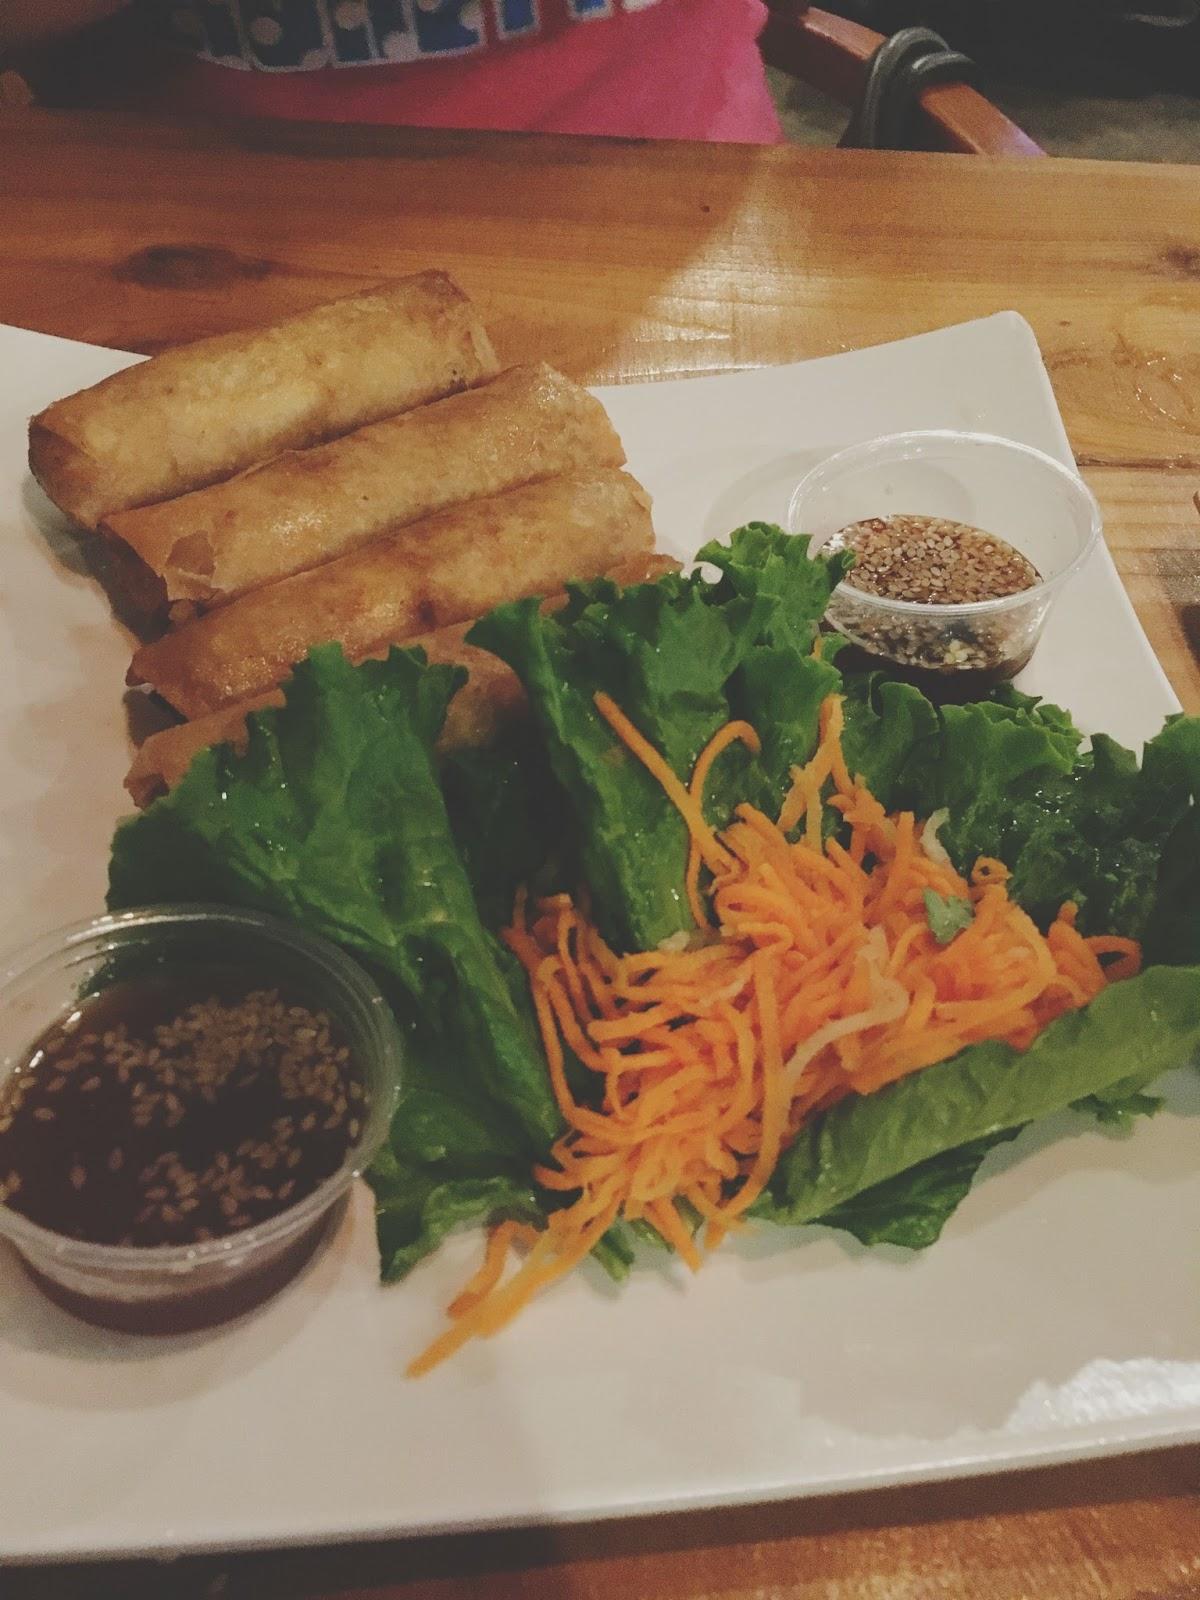 vegetarian egg rolls at Hughie's - A restaurant/bar in Houston, Texas